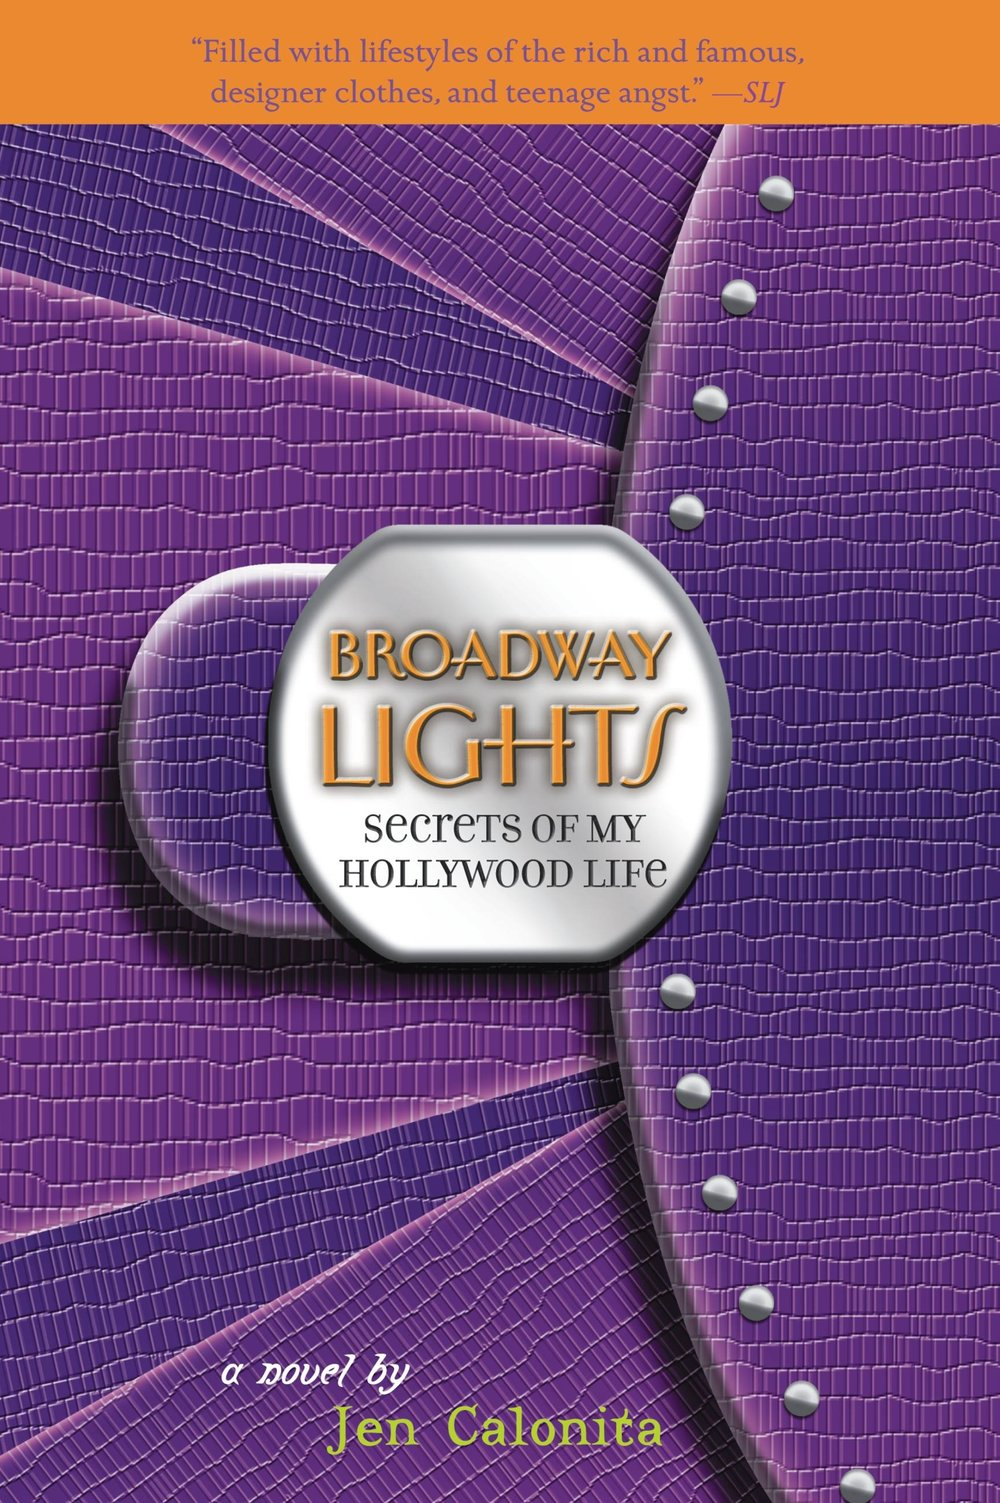 calonita-broadway-lights.jpg